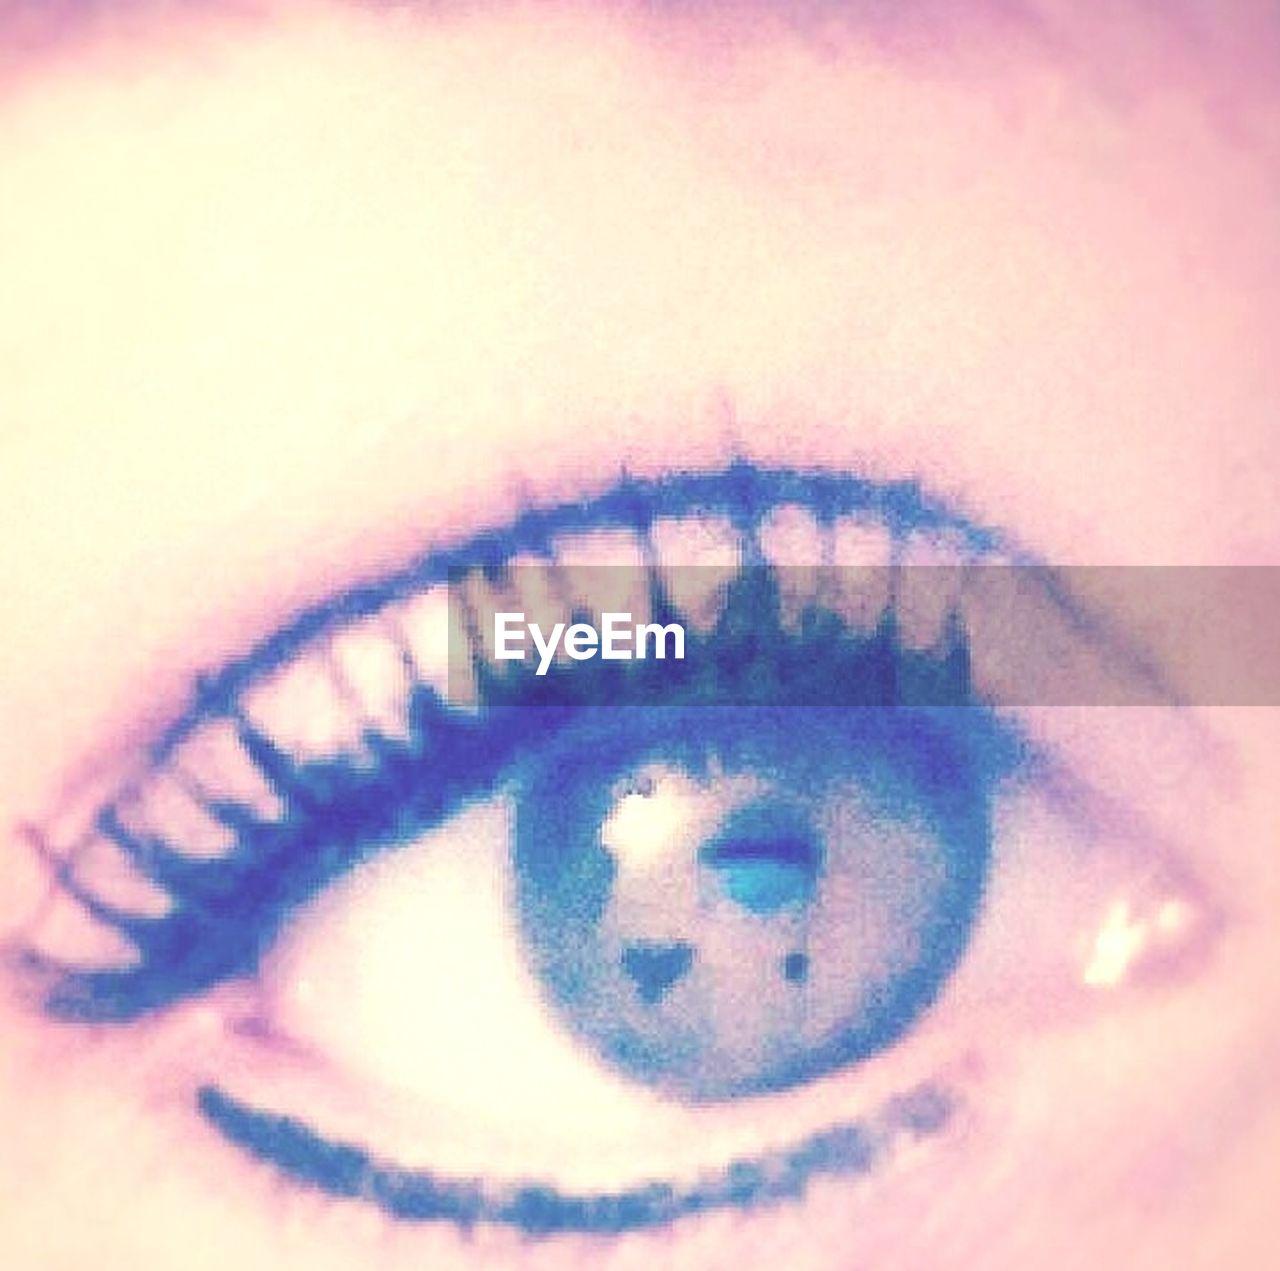 eyelash, human eye, human body part, sensory perception, eyesight, eyeball, macro, iris - eye, one person, close-up, real people, human skin, eyebrow, outdoors, day, adult, people